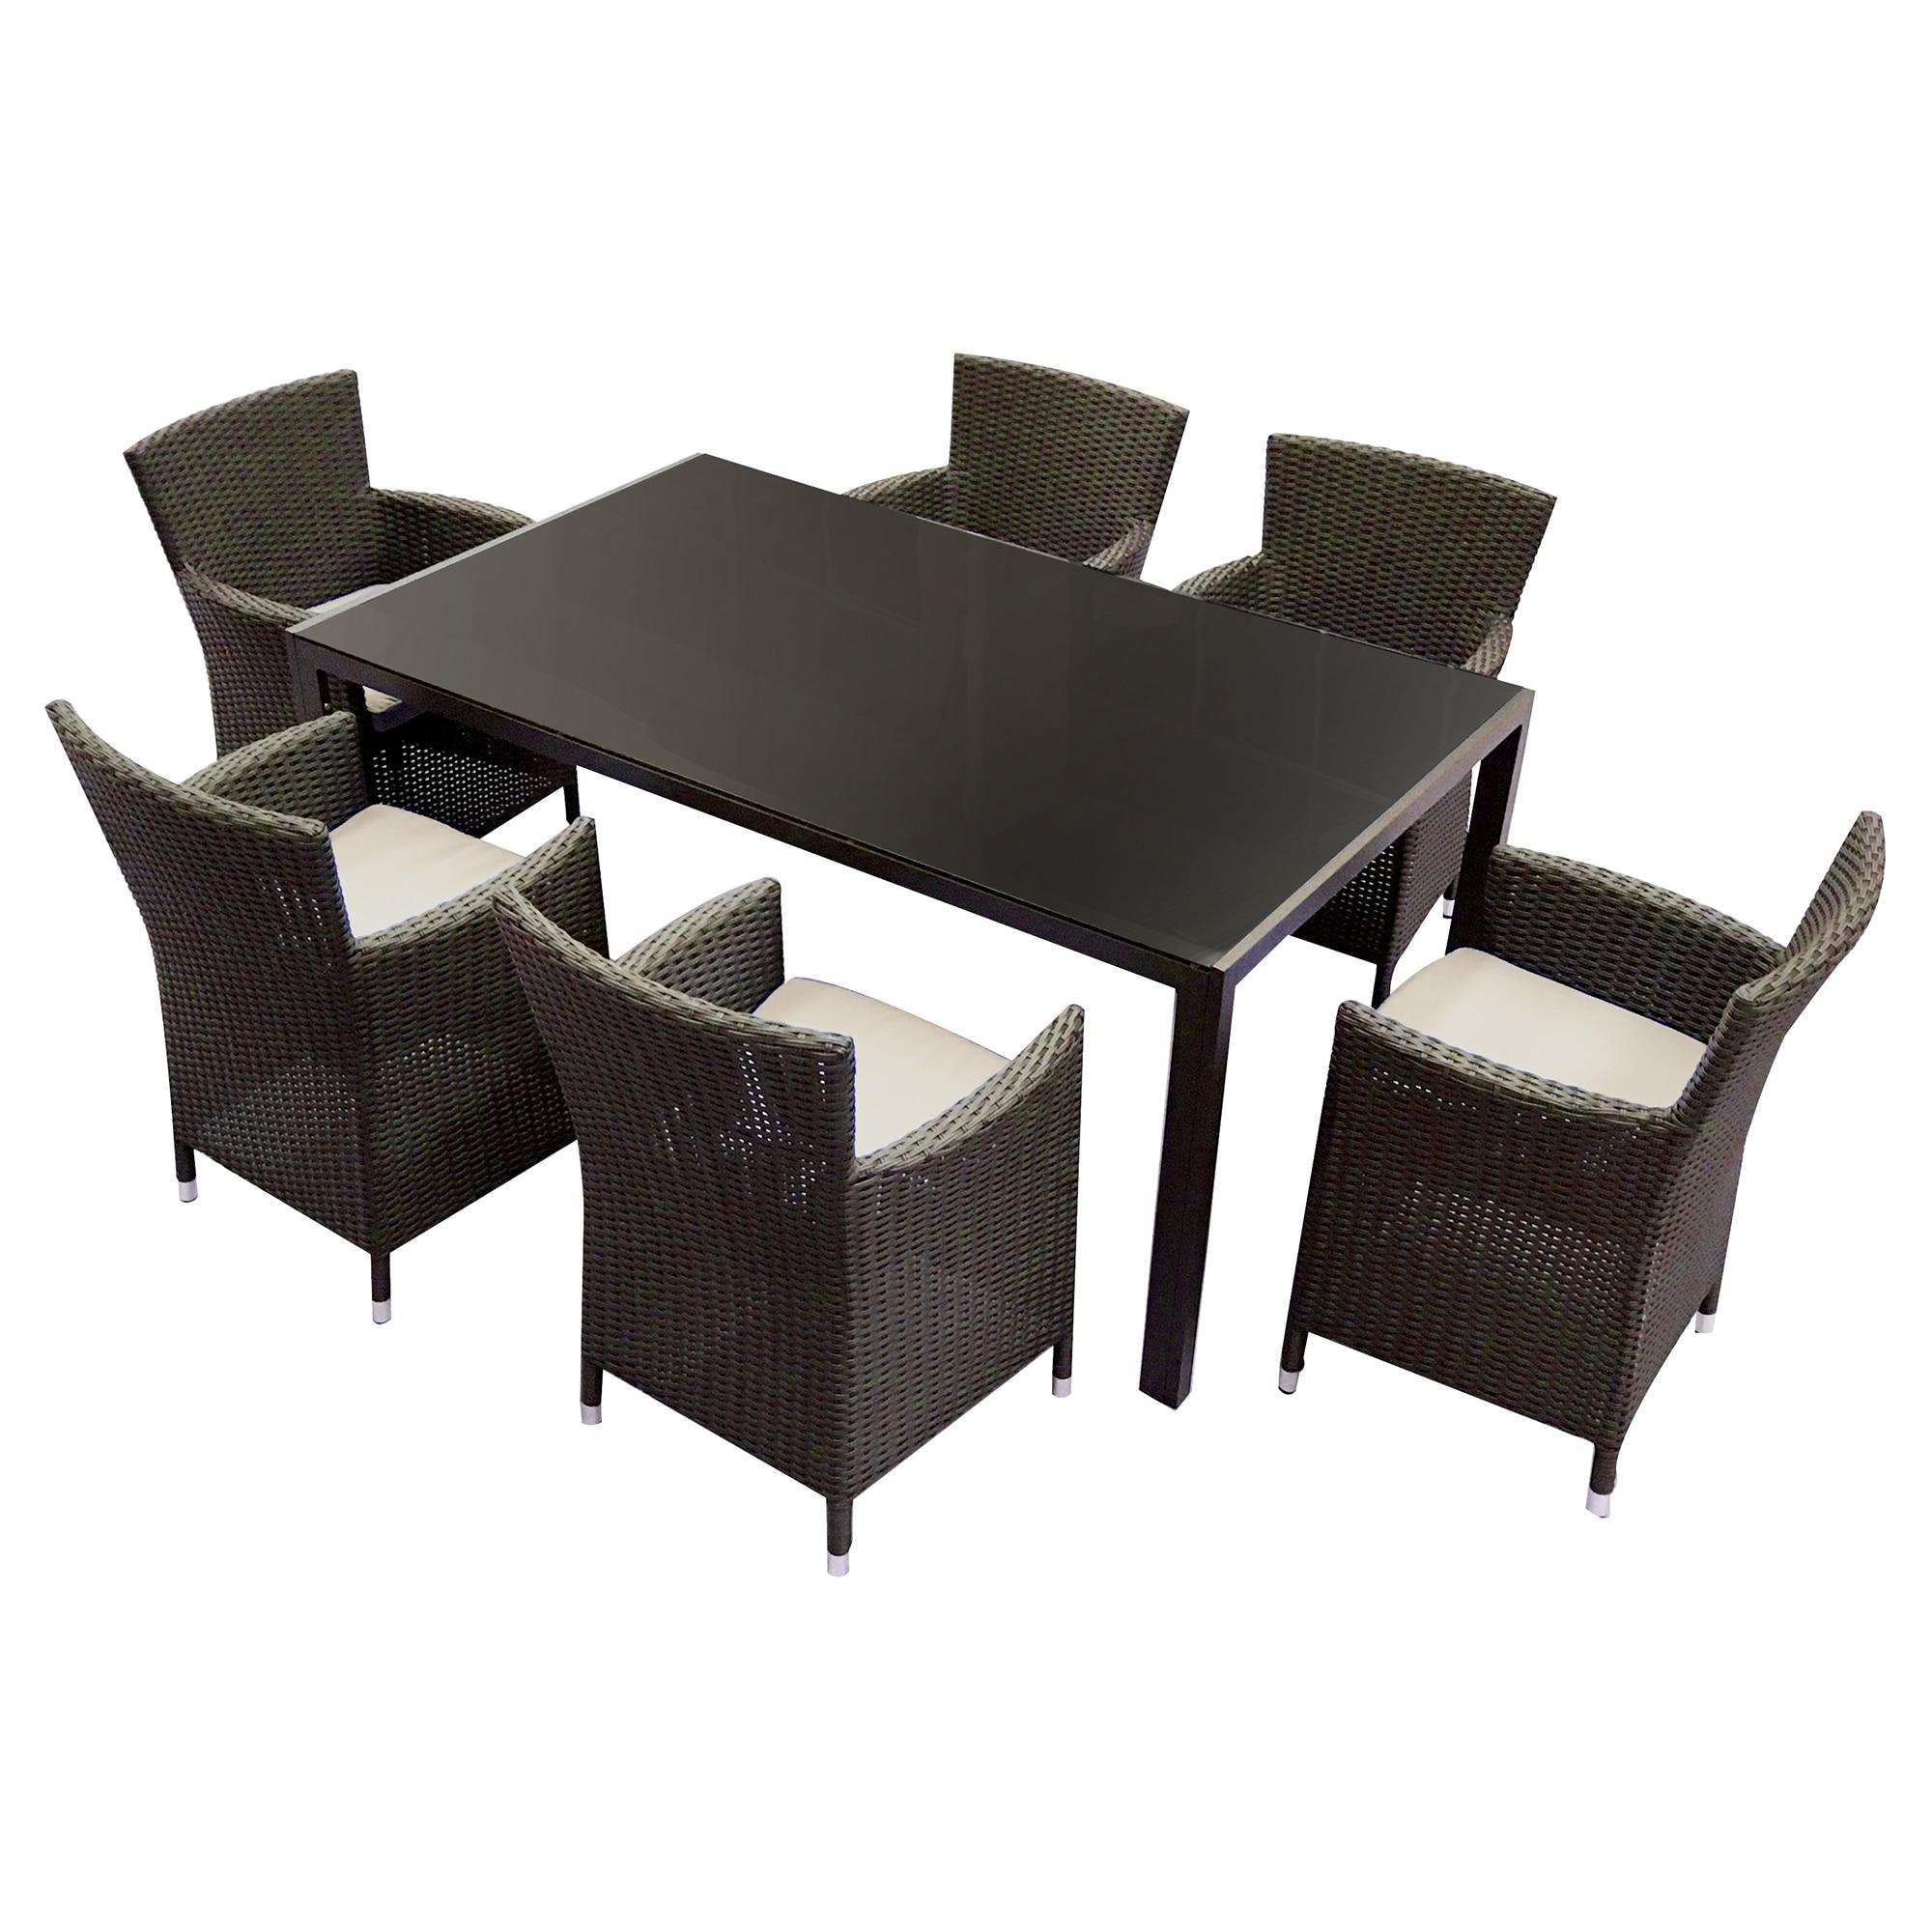 Fotografie Set mobilier gradina/terasa, Kring Thomas, masa cu 6 scaune, 167.5x101.5x73, maro